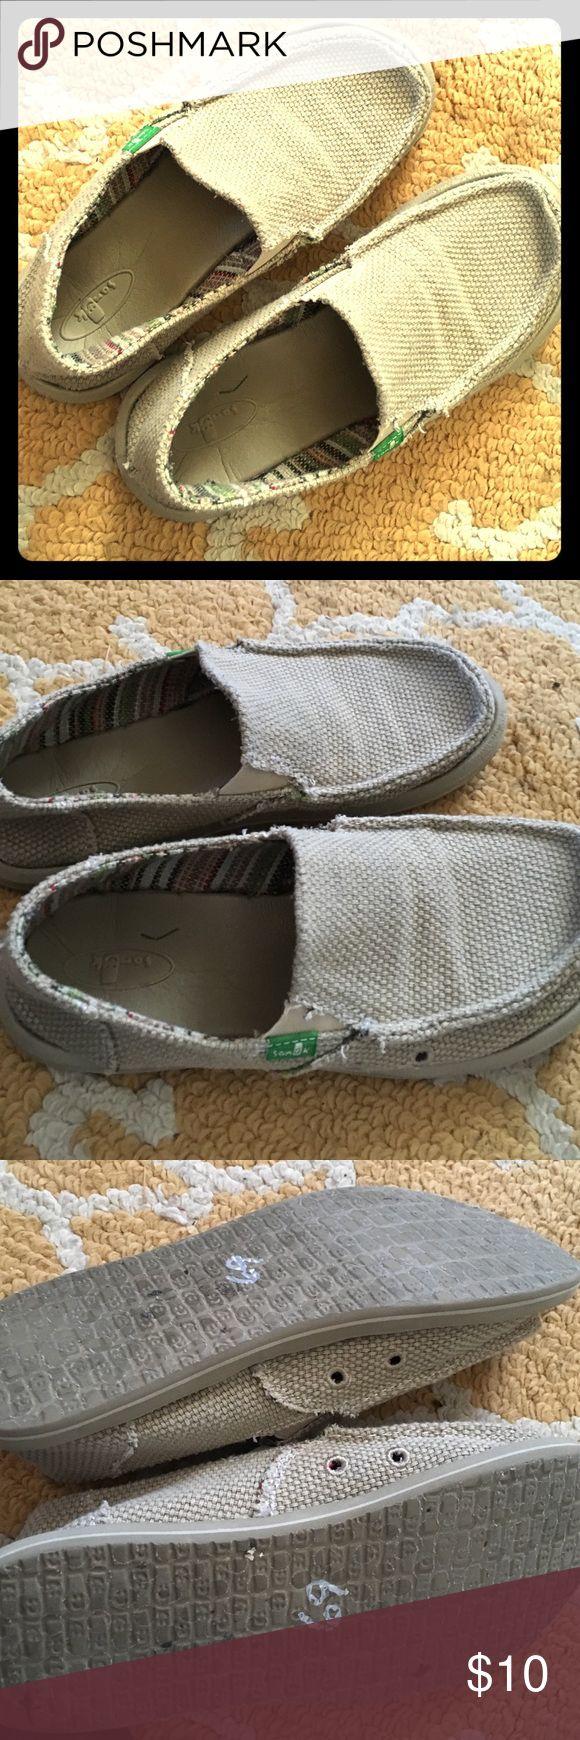 Sanuk men's sz6 chill vagabond shoes Great prepared condition. Vagabond Chill Slip-On Shoes SIZE 6 Sanuk Shoes Loafers & Slip-Ons